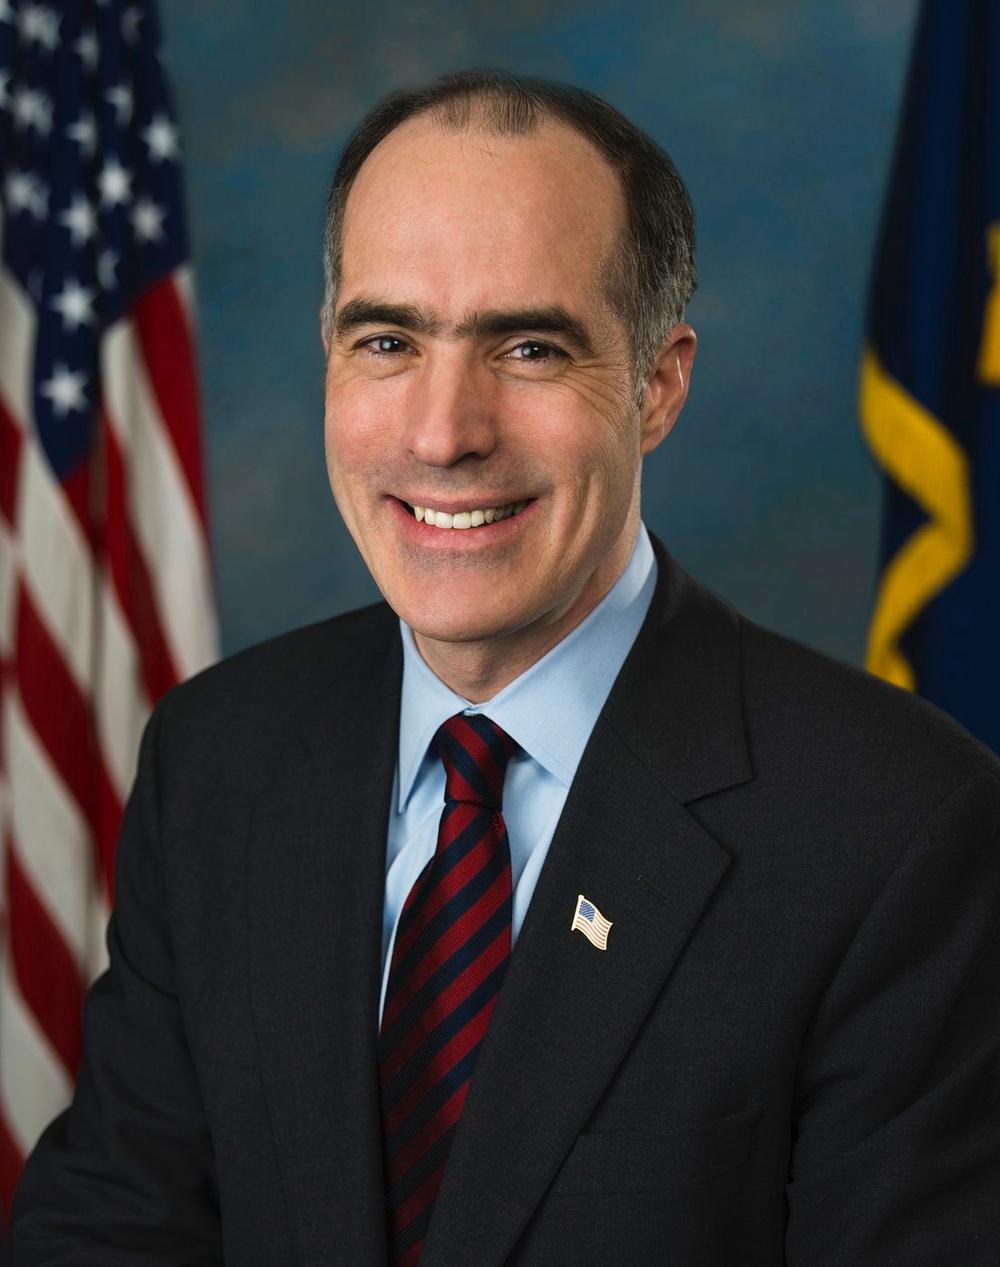 U.S. Senator Robert Casey, Jr. (D-PA)